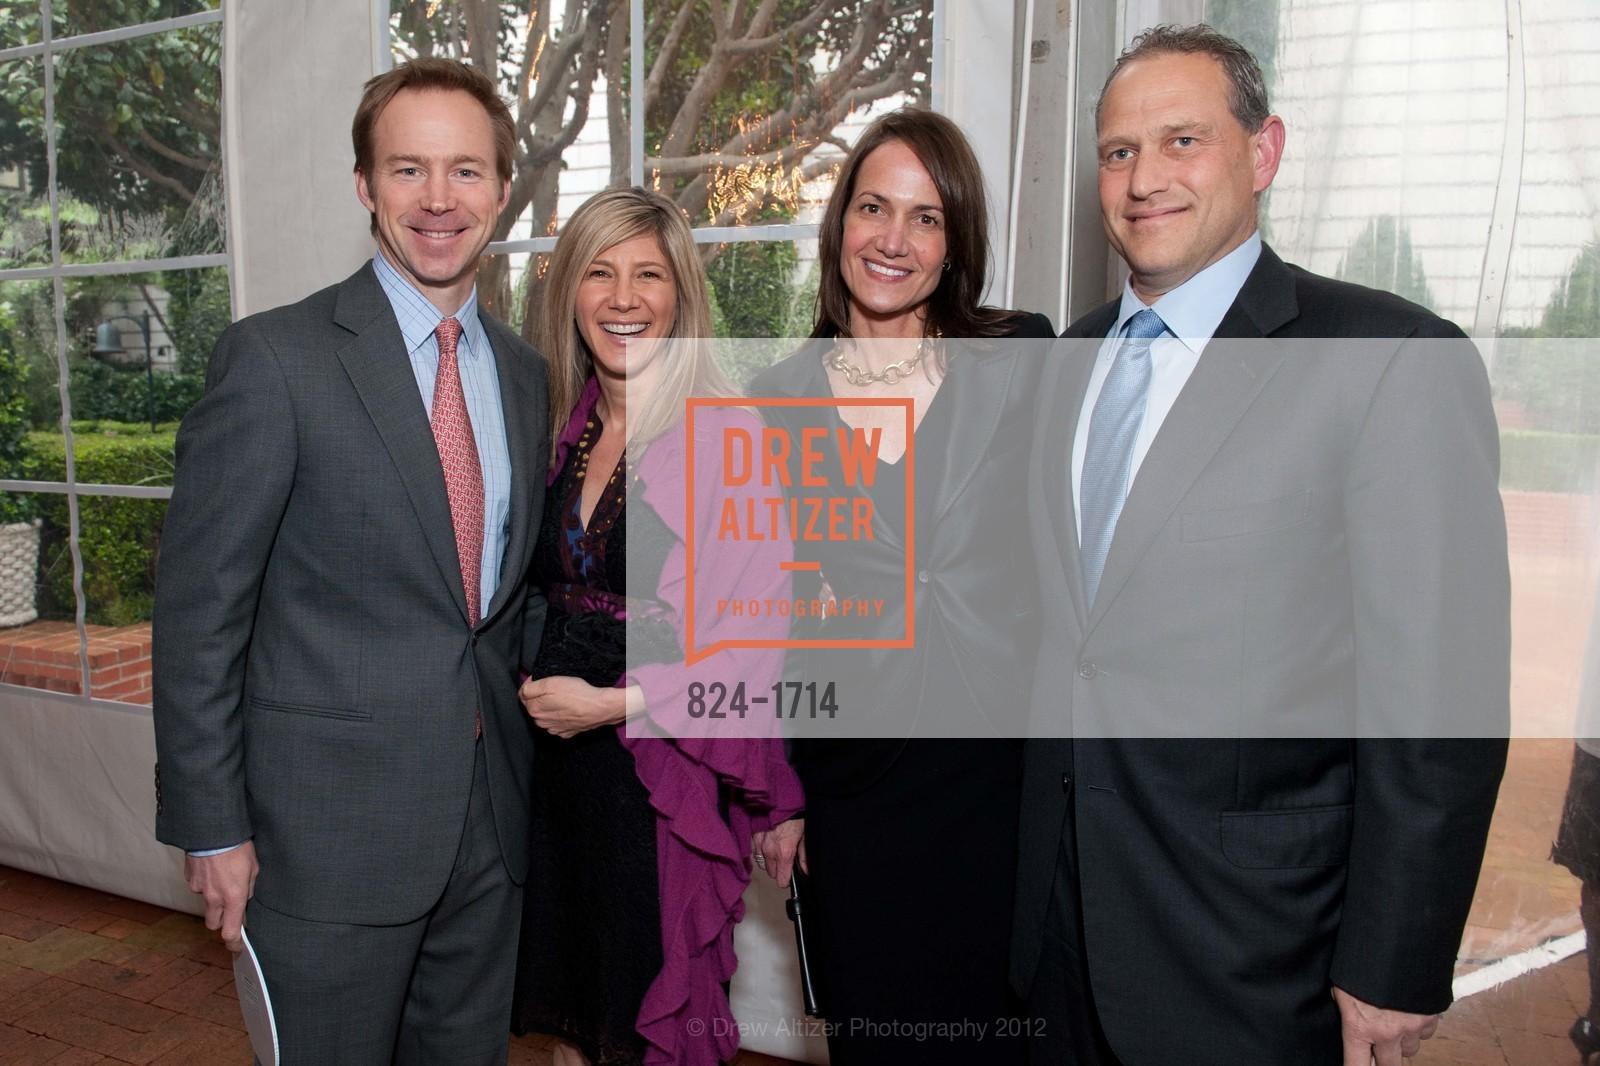 Eric Johnson, Jennifer Kuperman, Sarah Moody, Doug Michelman, Photo #824-1714